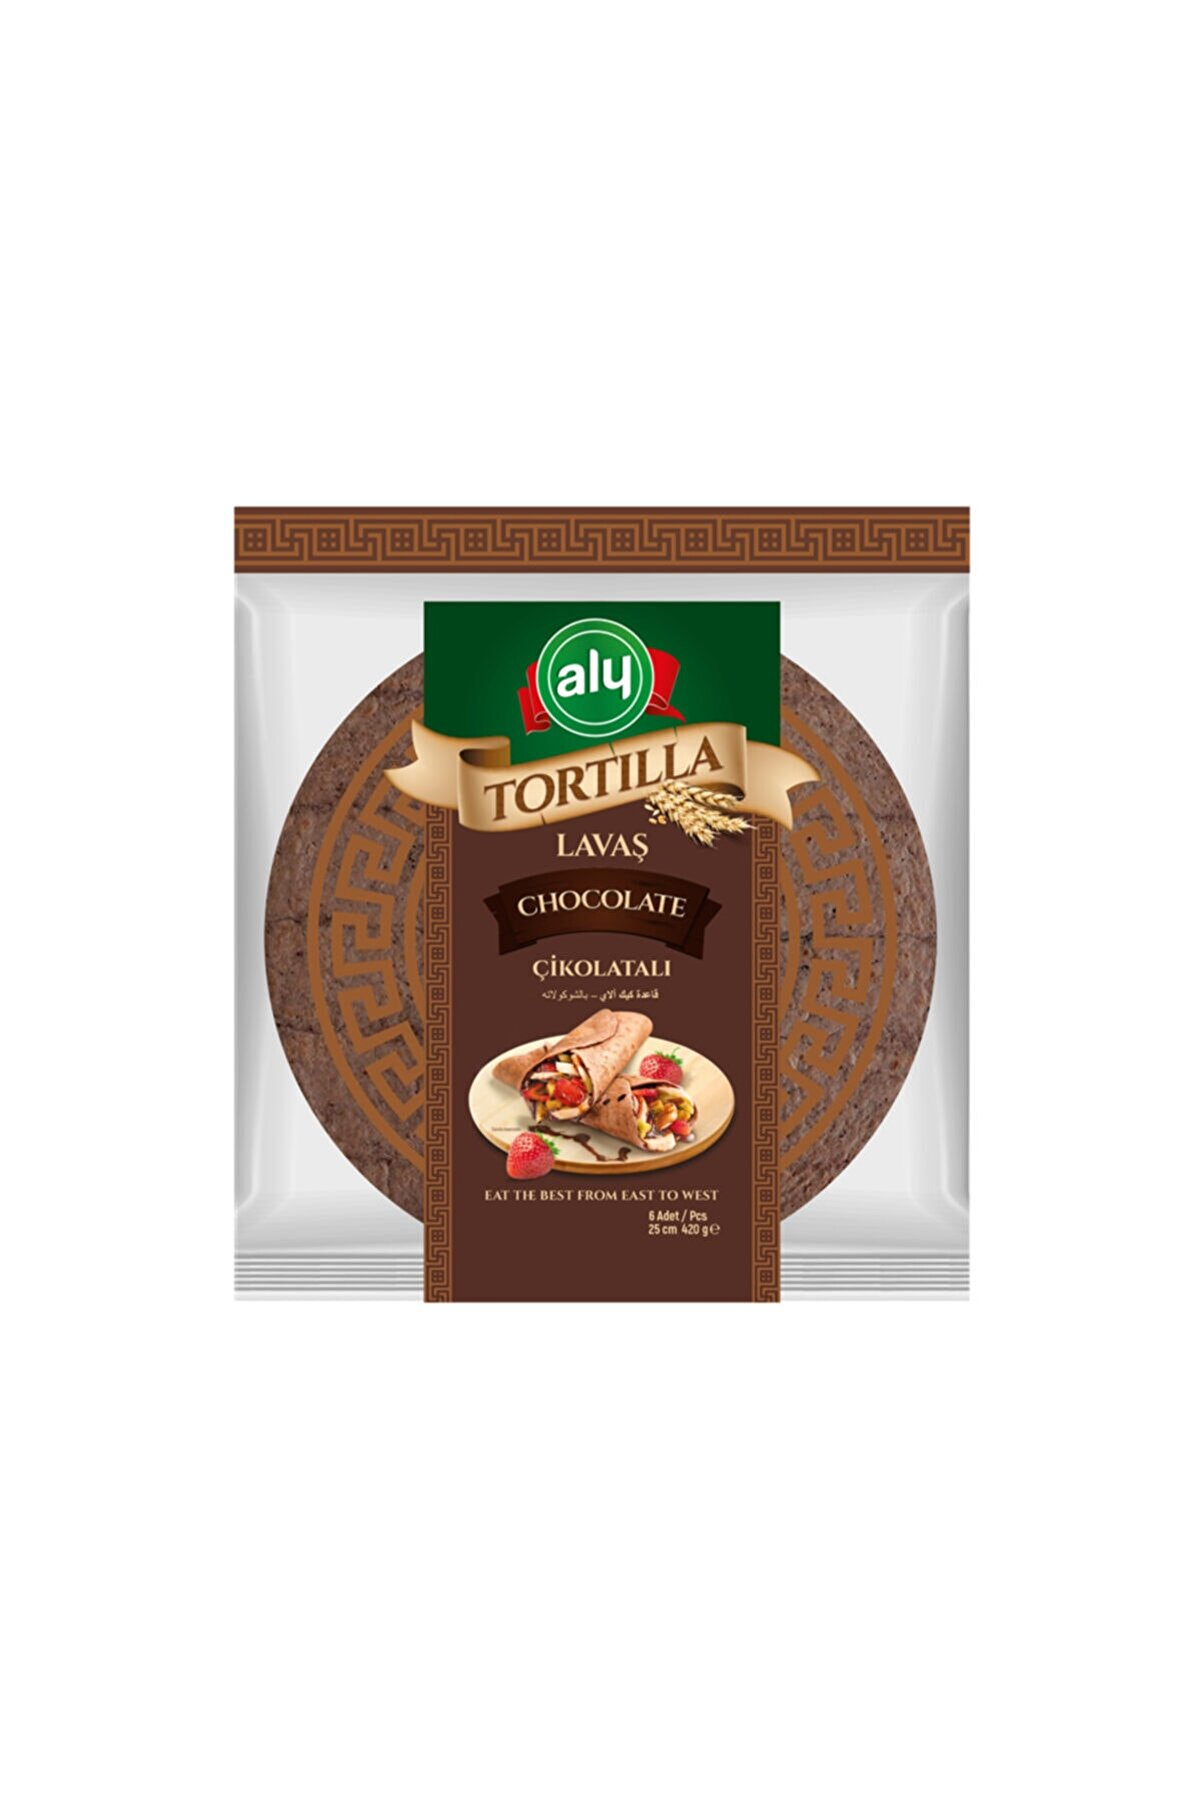 Aly Çikolatalı Tortilla Lavaş 25 cm 6'lı Paket 420g